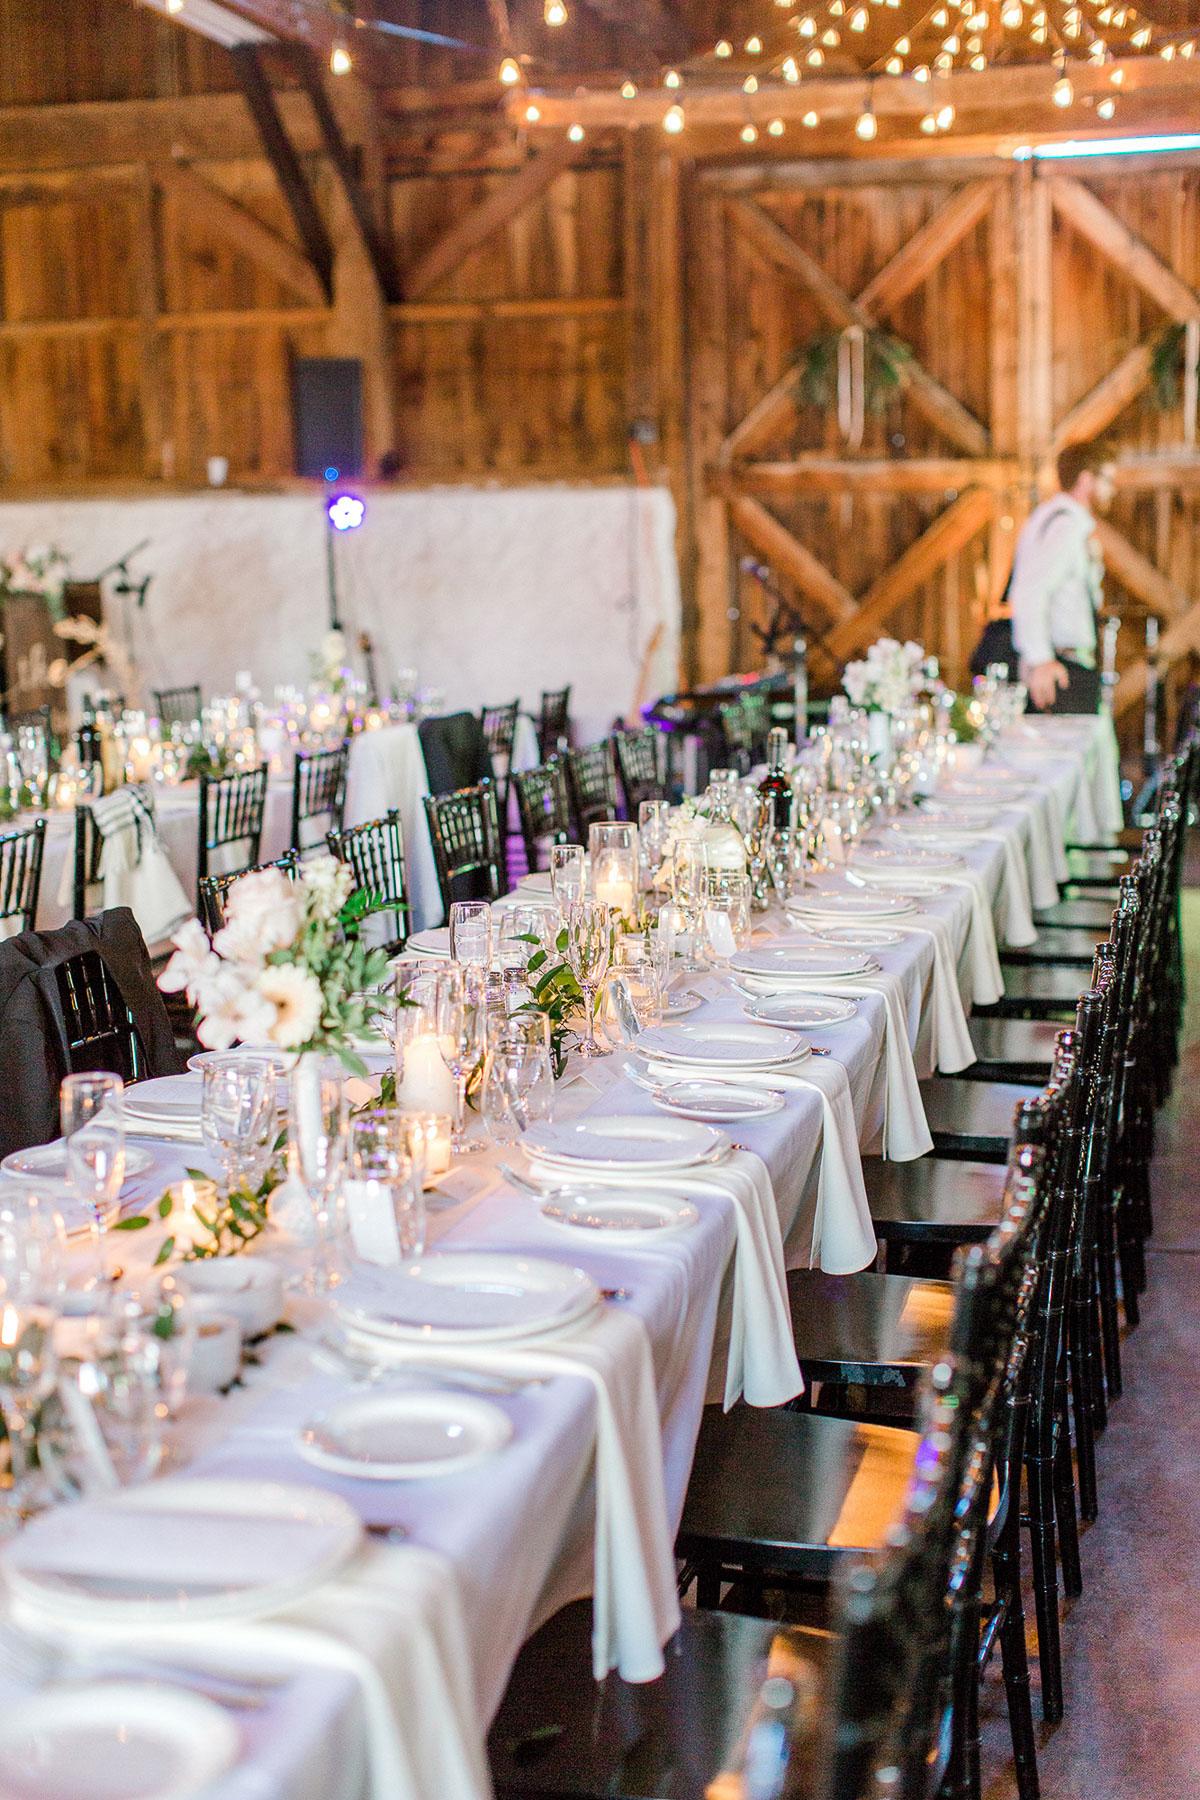 beatrice-elford-photography-vineyard-bride-swish-list-balls-falls-vineland-wedding-66.jpg